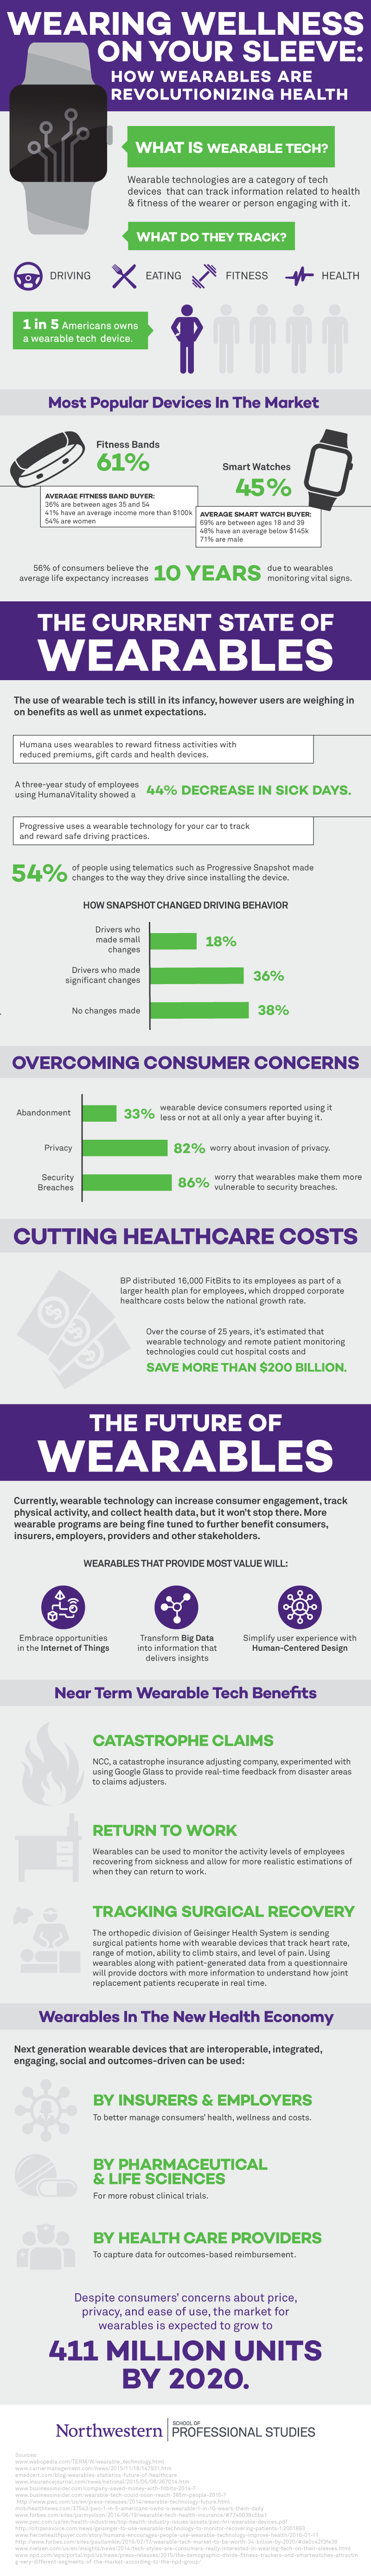 northwestern-univ-study-wearable-tech-and-insurance